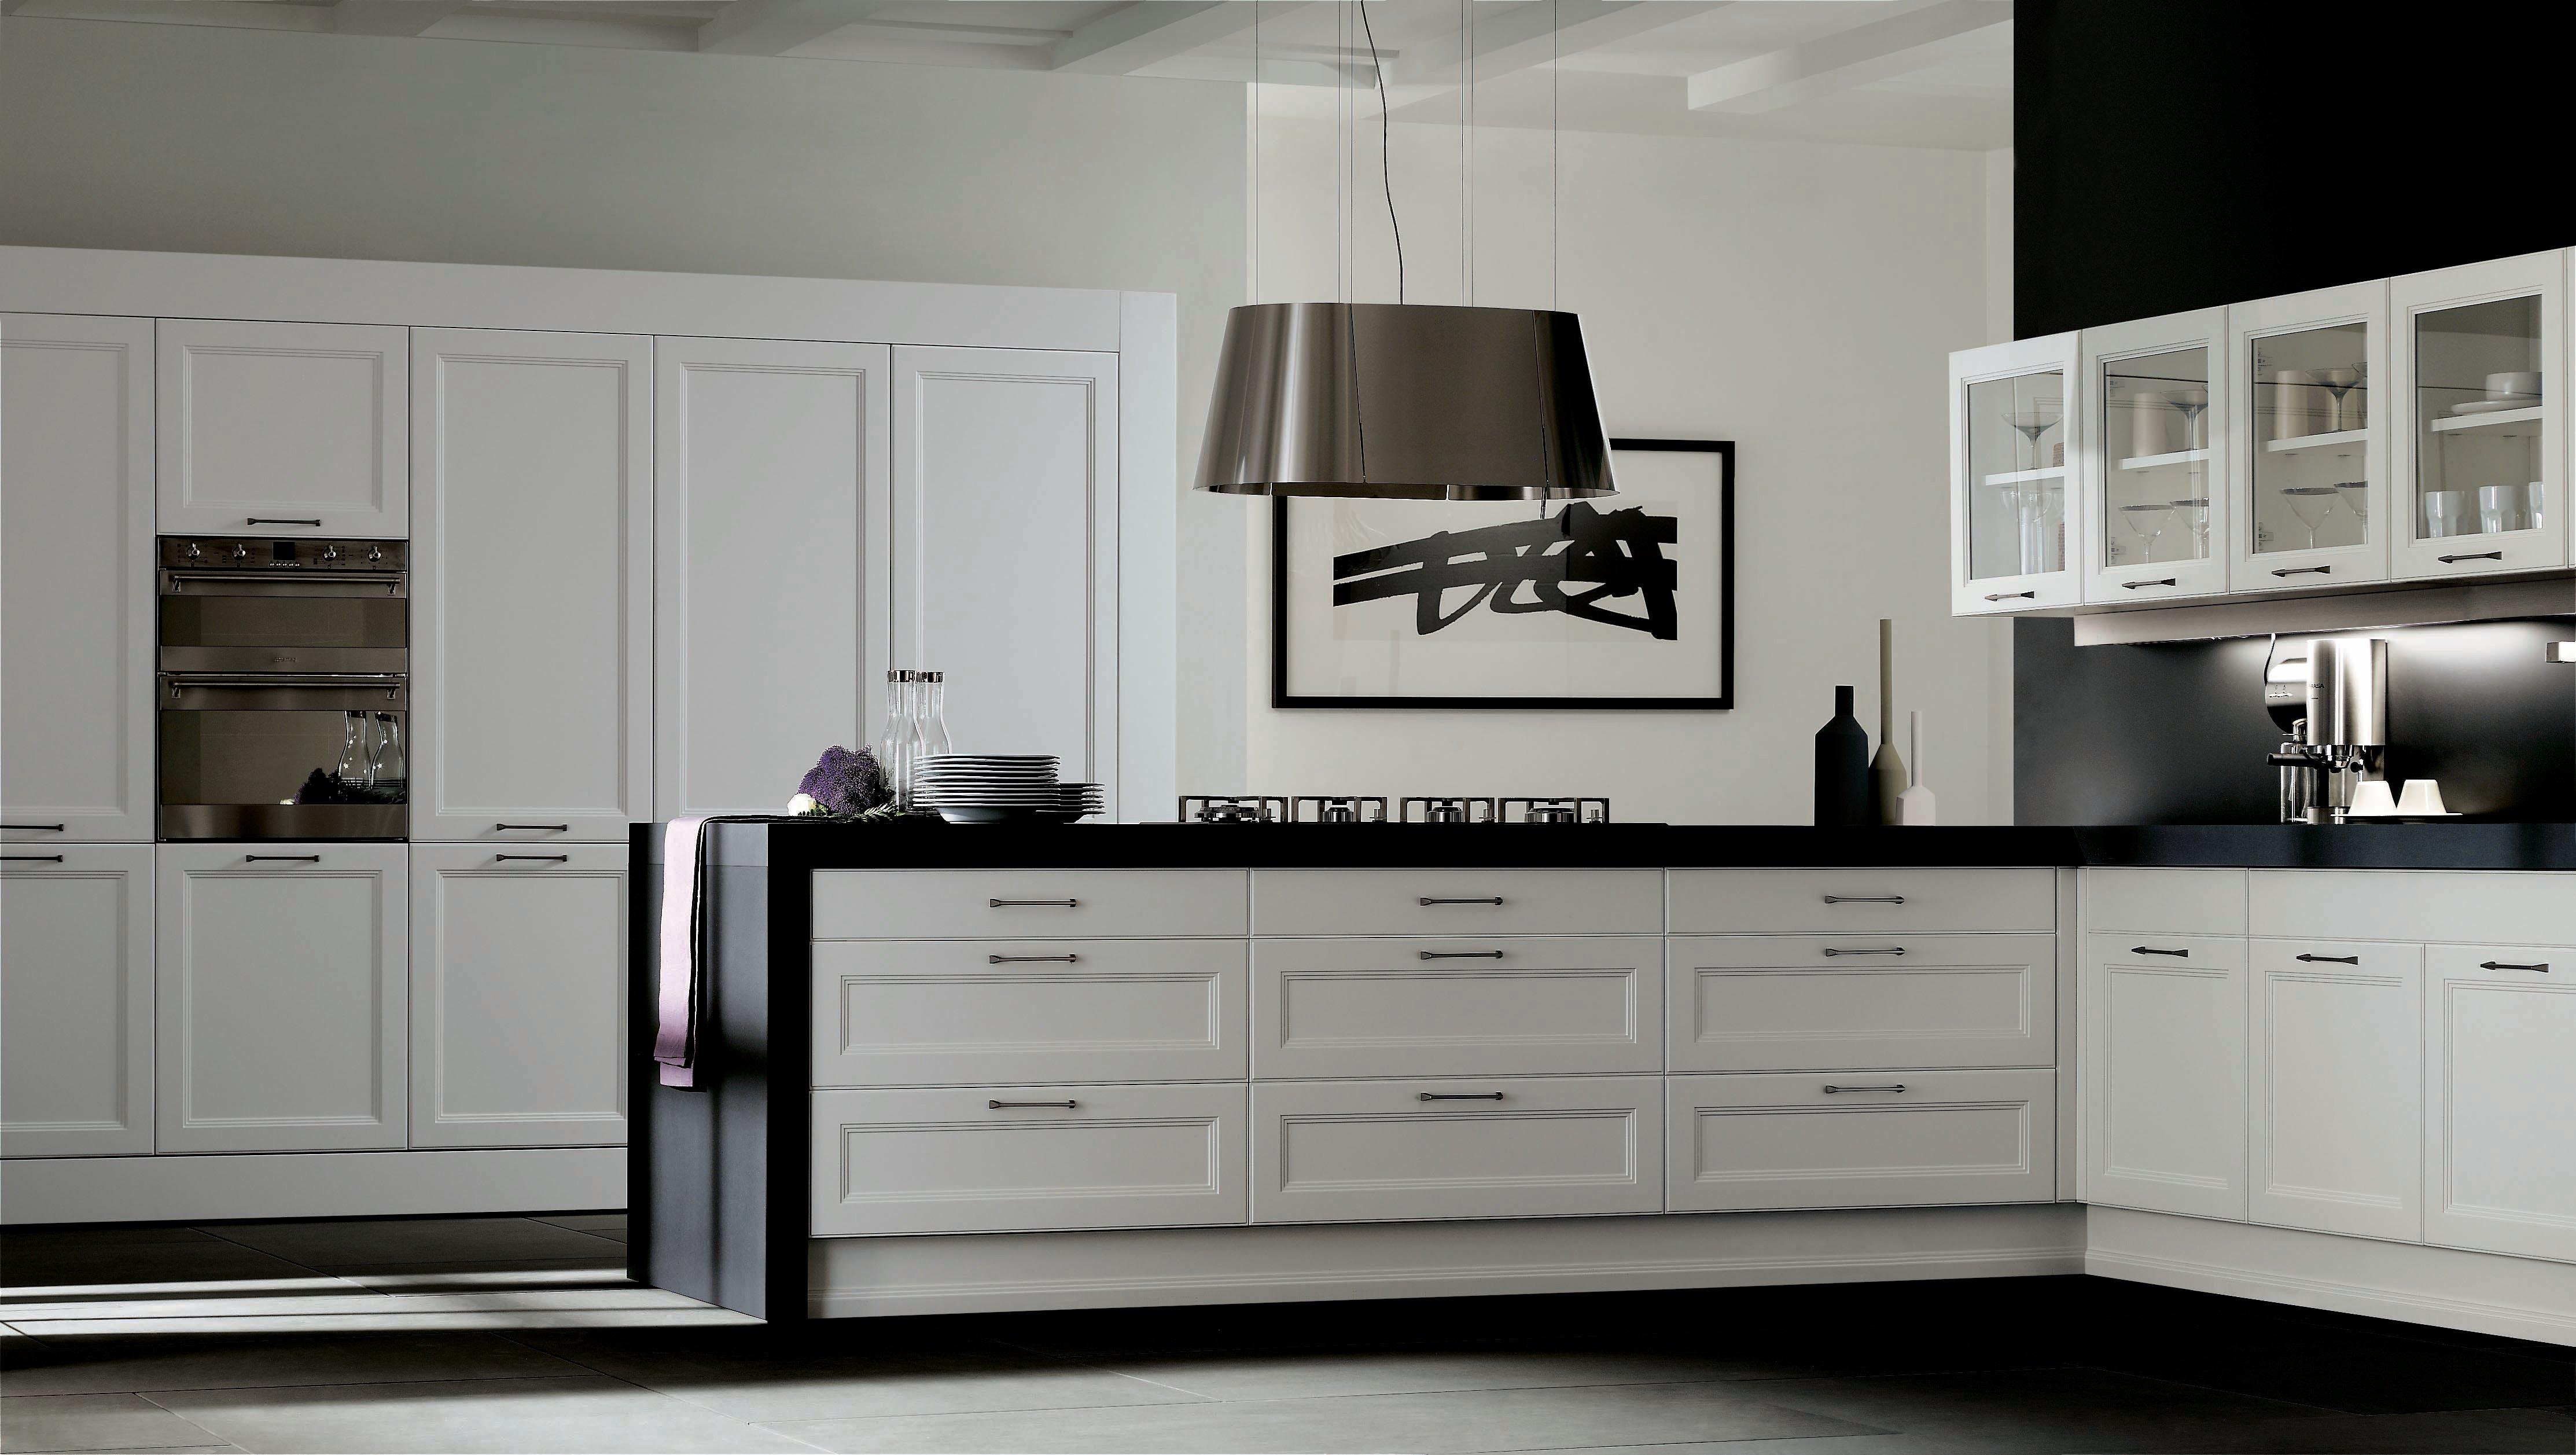 Muebles de cocina modernos y cl sicos gunni trentino - Gunni trentino cocinas ...